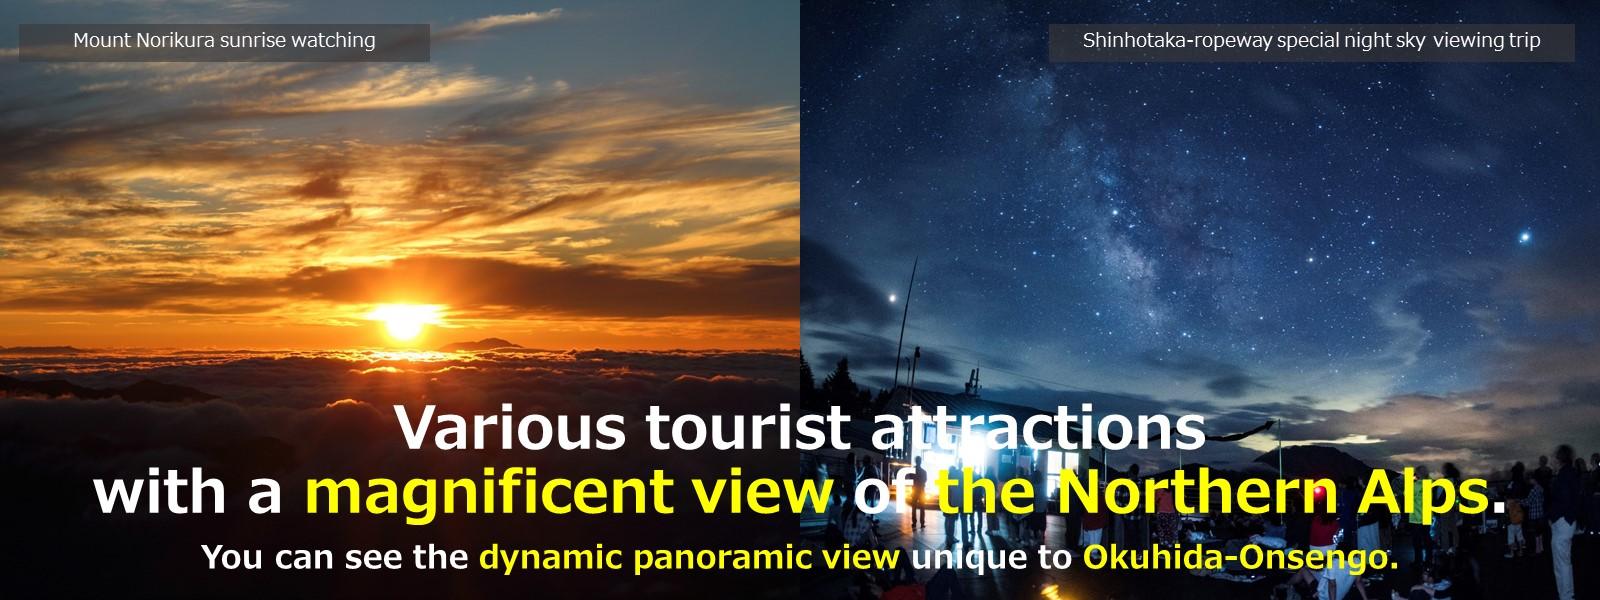 Okuhida-onsengo | Shinhotaka-ropeway special night sky viewing trip